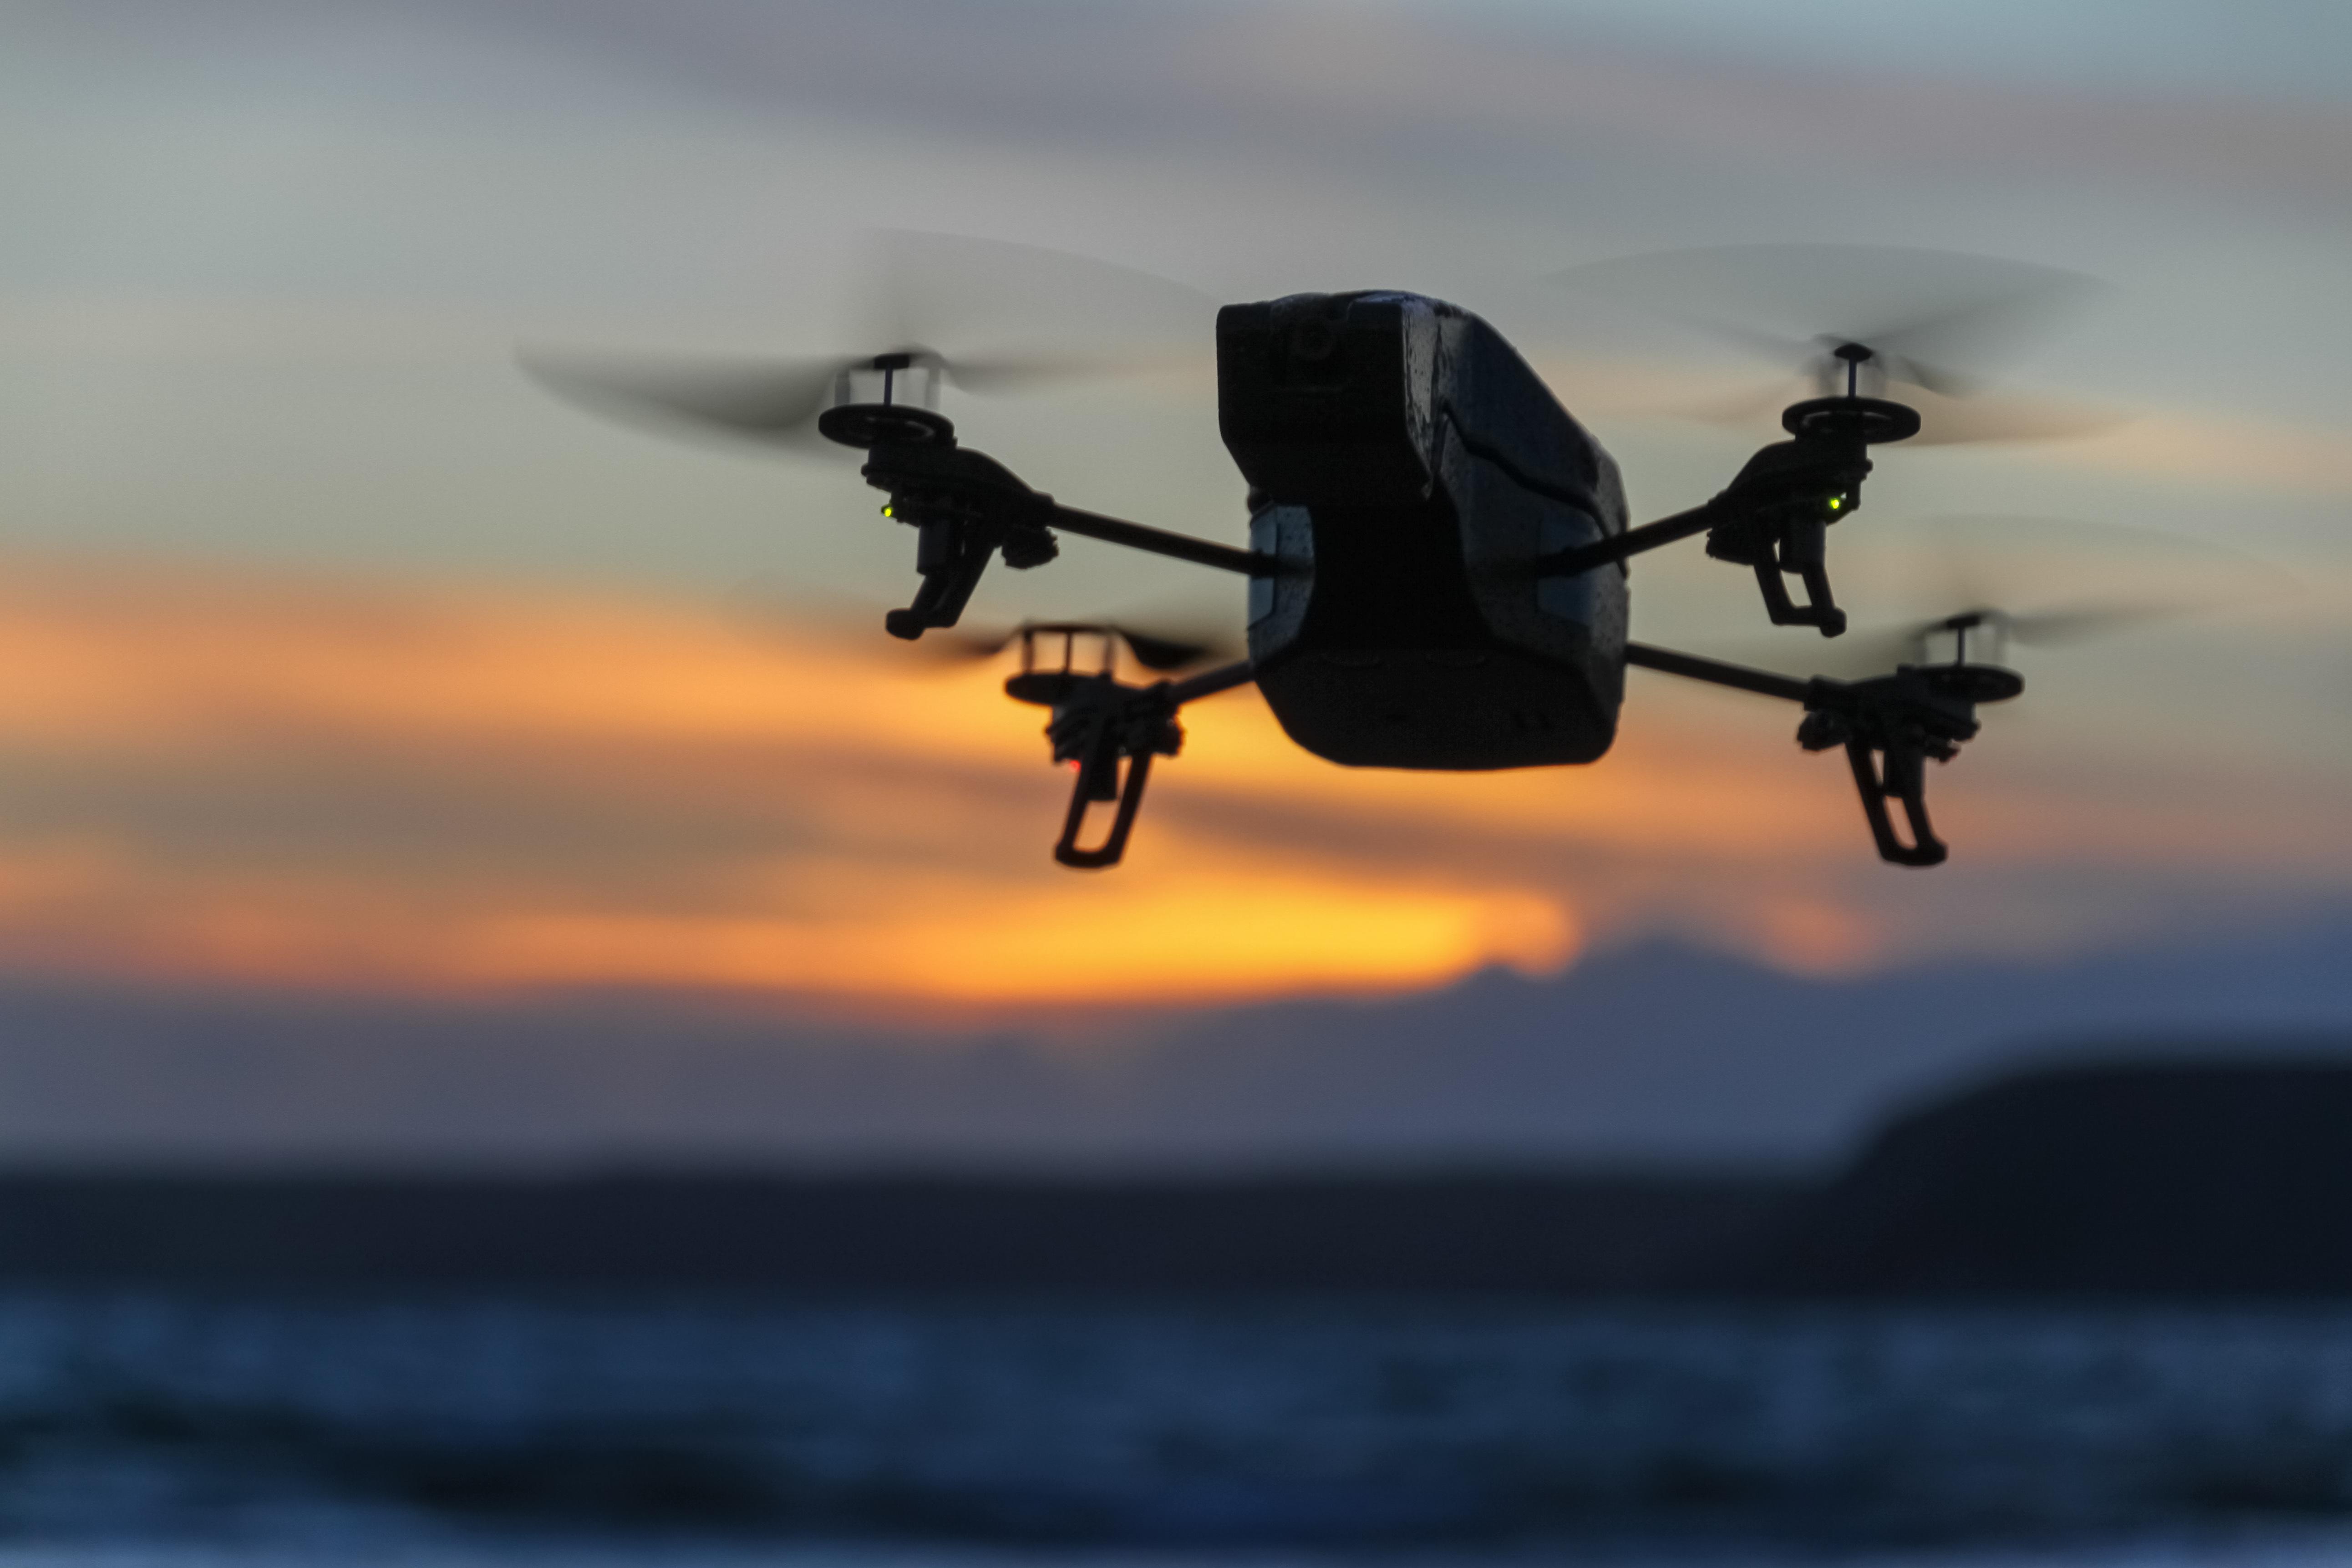 Ar Drone 2.0 Carbon